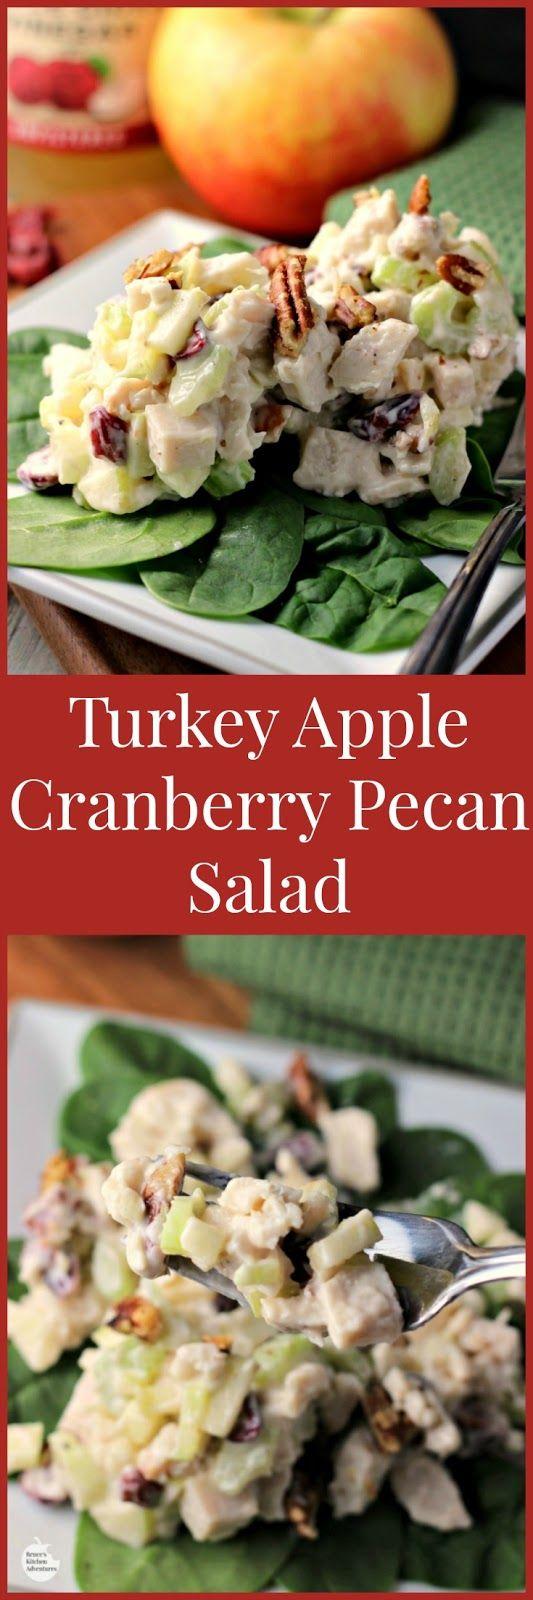 Turkey apple cranberry pecan salad renee 39 s kitchen for Renee s kitchen